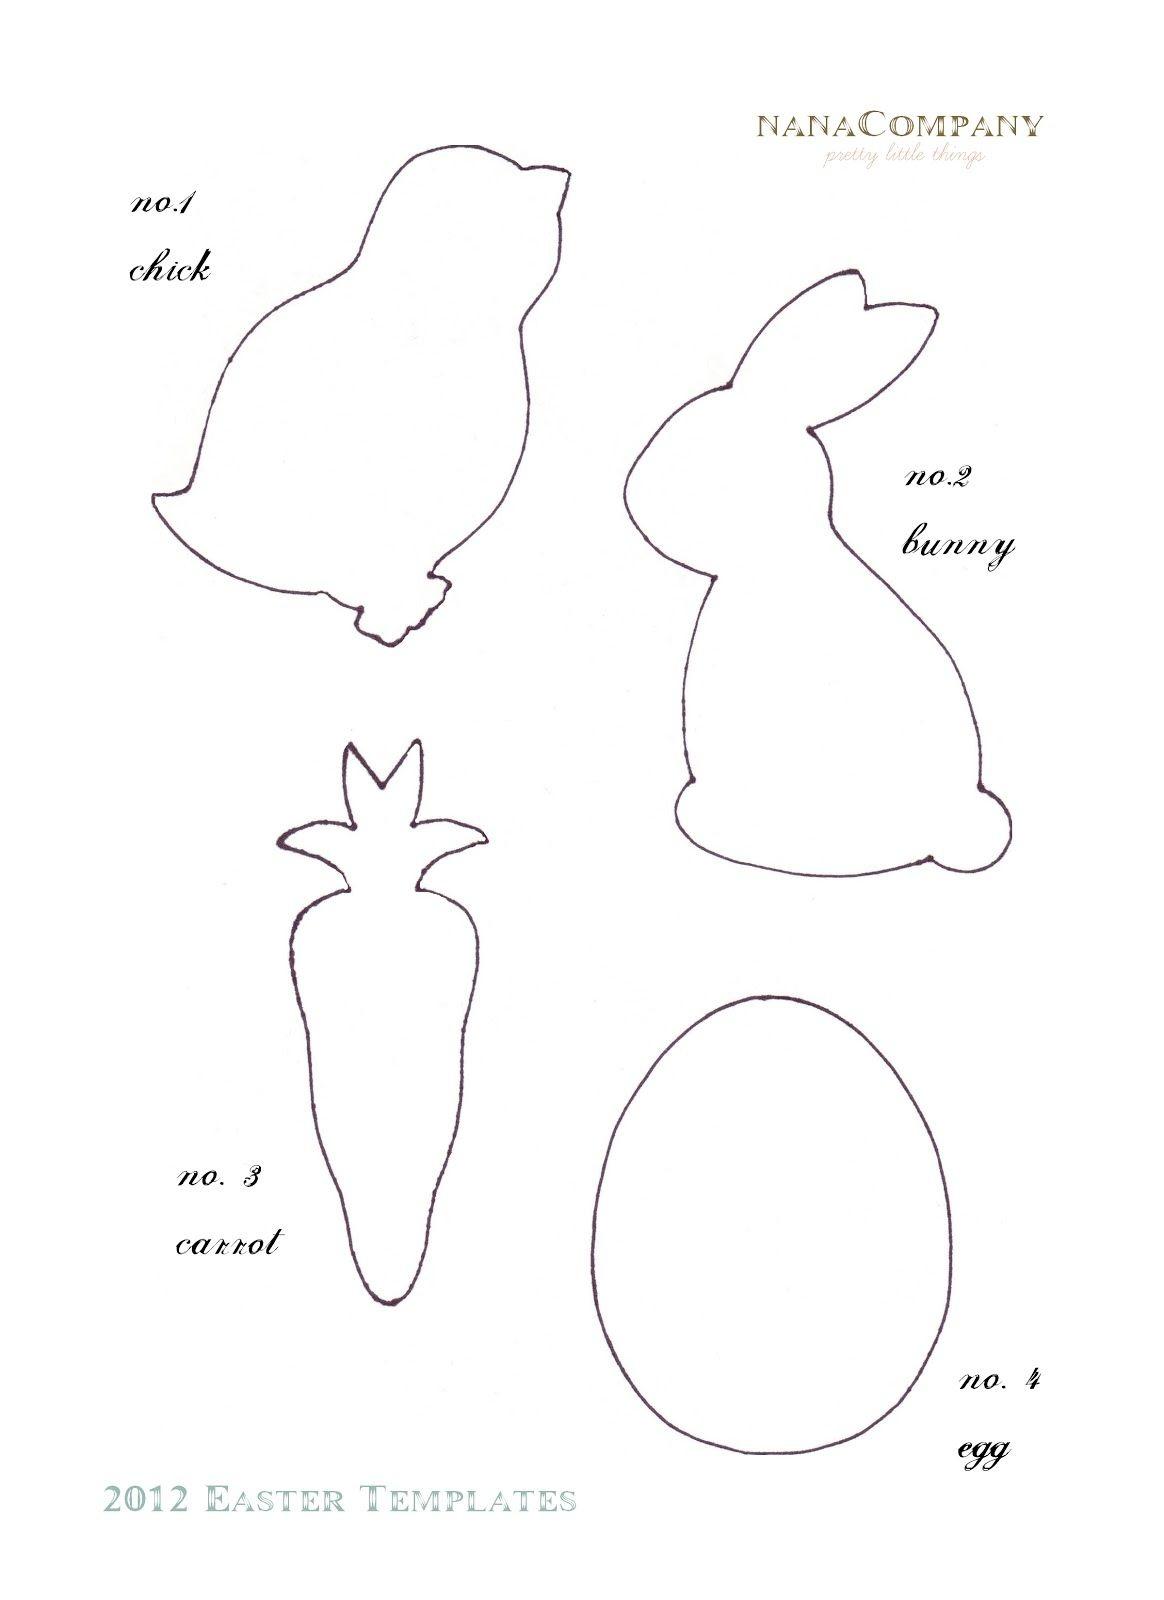 Felt Easter Patterns Free | Free+Printable+Easter+Template+For+ - Free Printable Easter Bunting